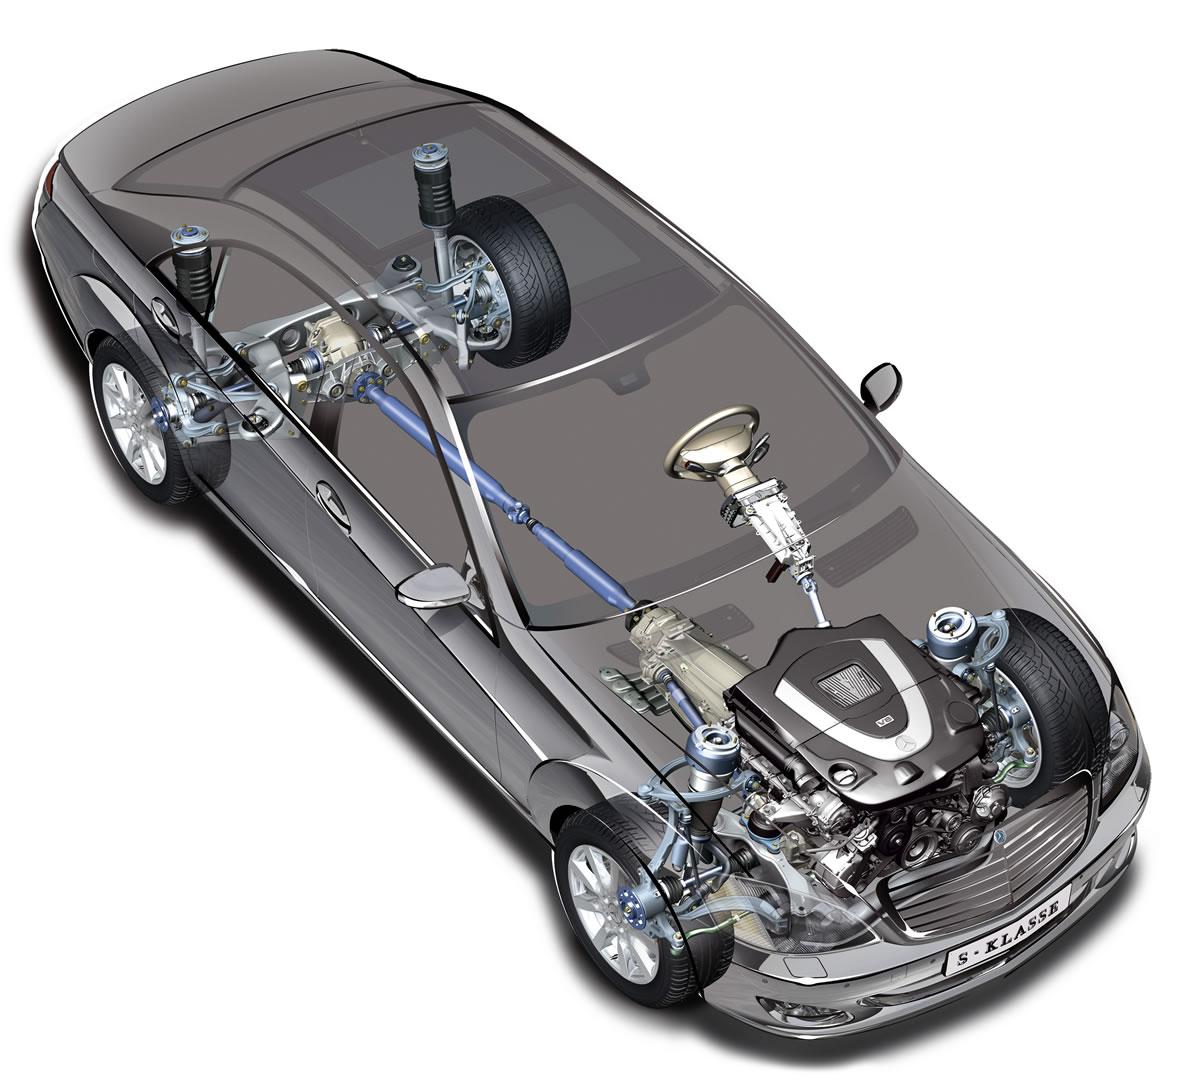 mercedes s350 bluetec 4 matic all wheel drive awd system [ 1200 x 1080 Pixel ]